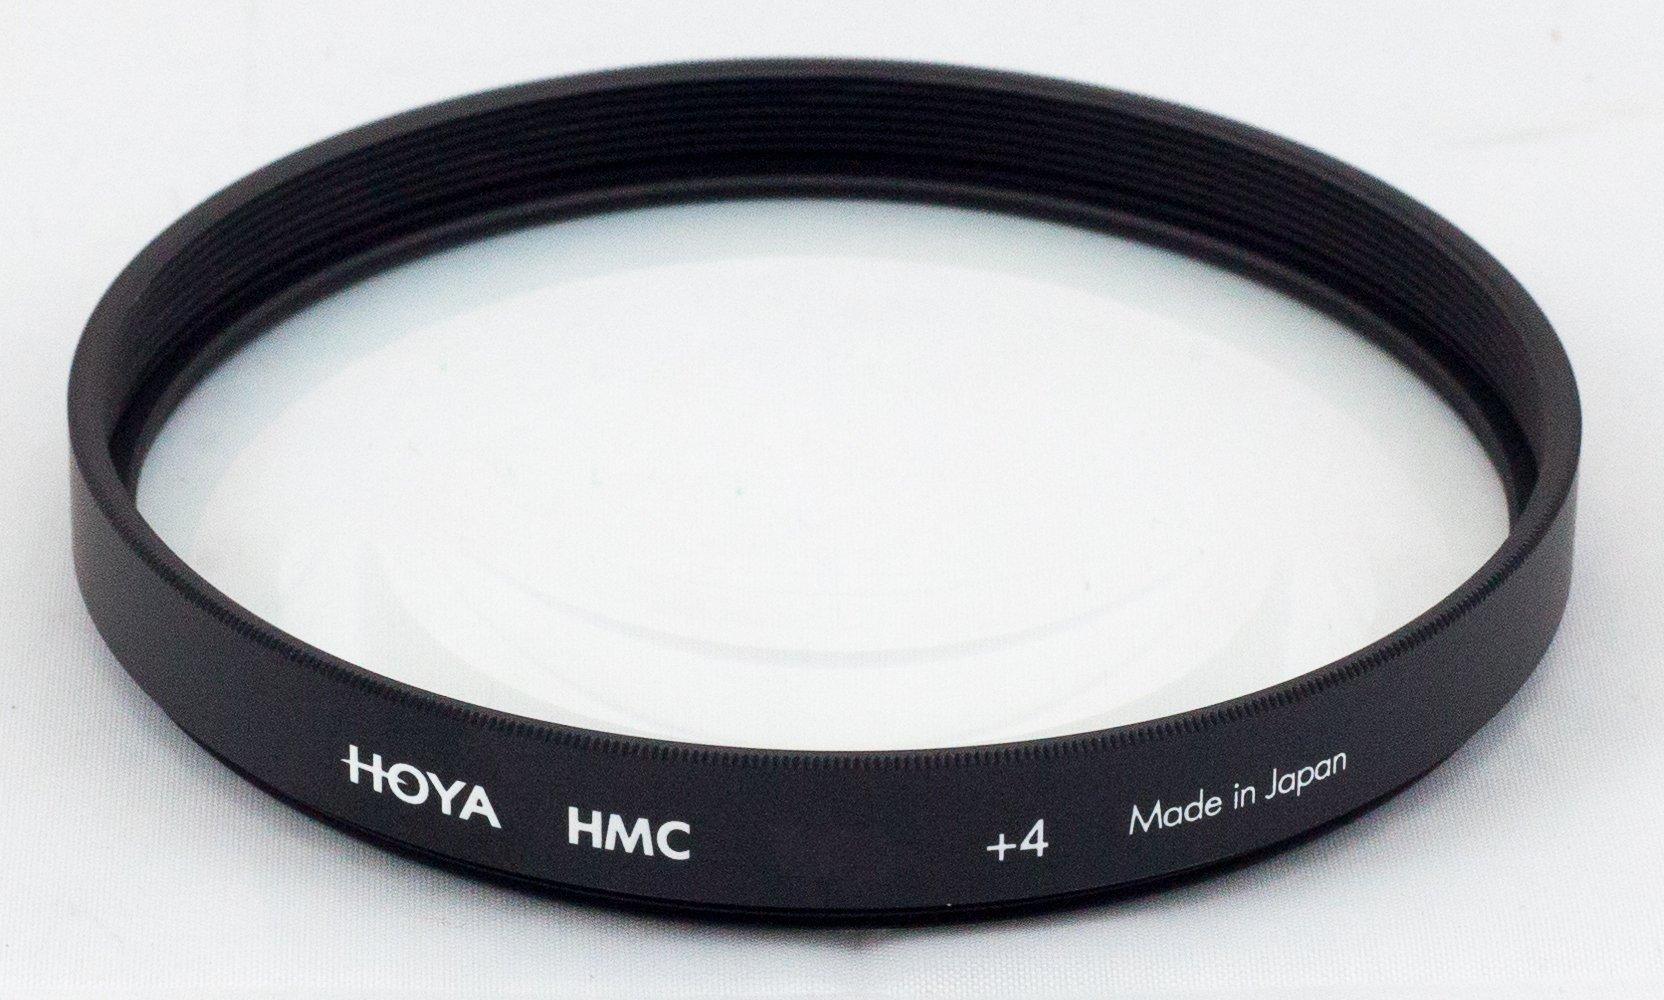 Hoya 46mm Close-up Multi-Coated Filter Set with +1, +2 & +4 Macro Lenses.